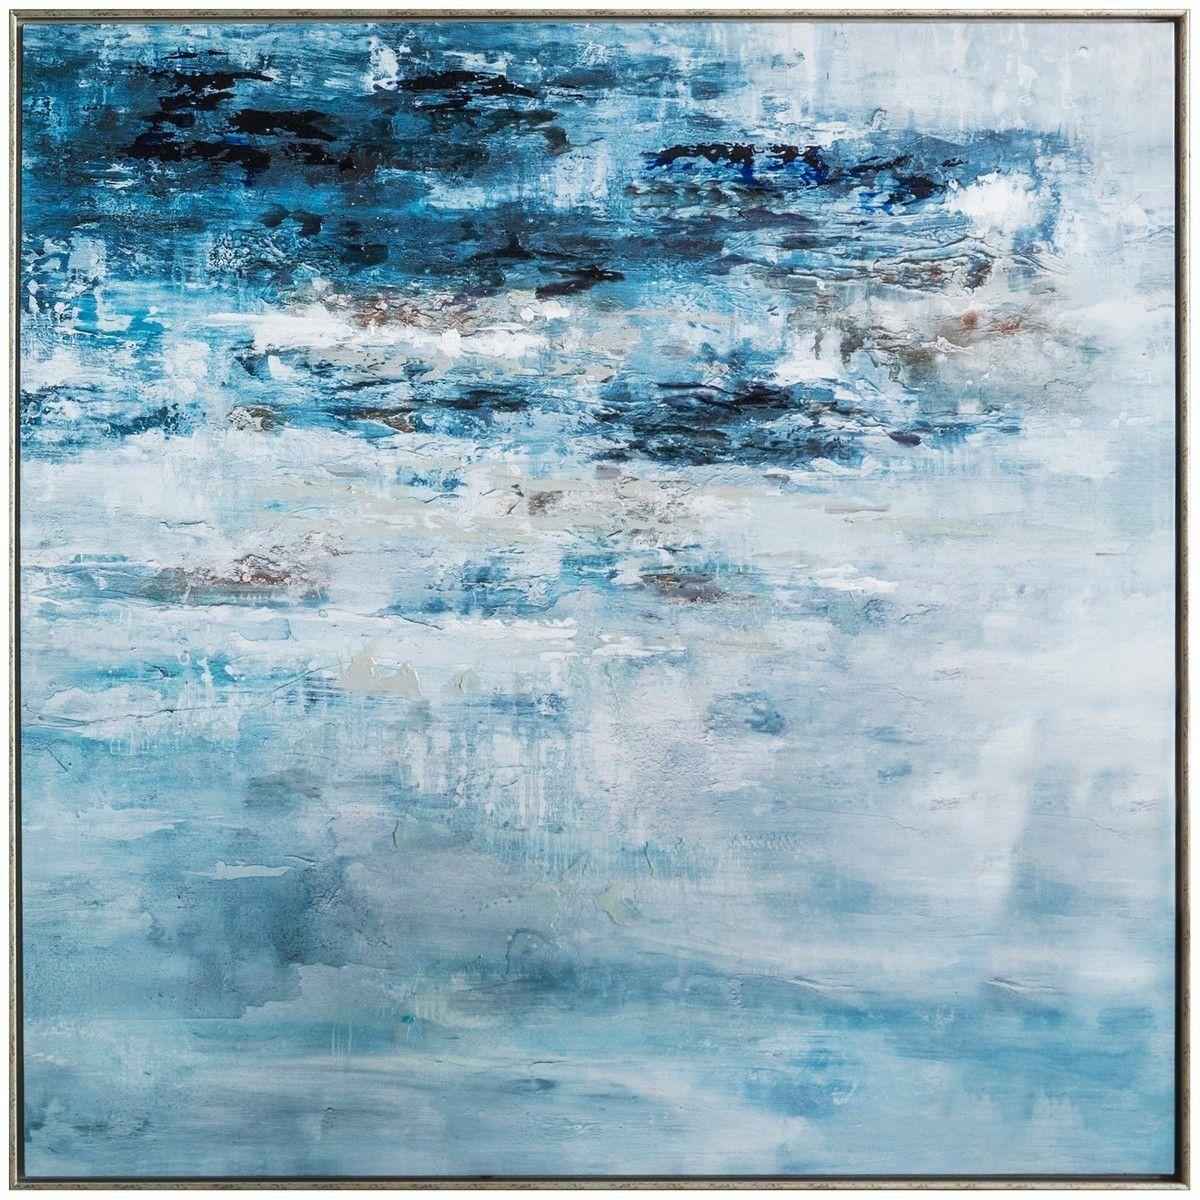 Pacific sea storm framed giclee canvas wall art print cm sea